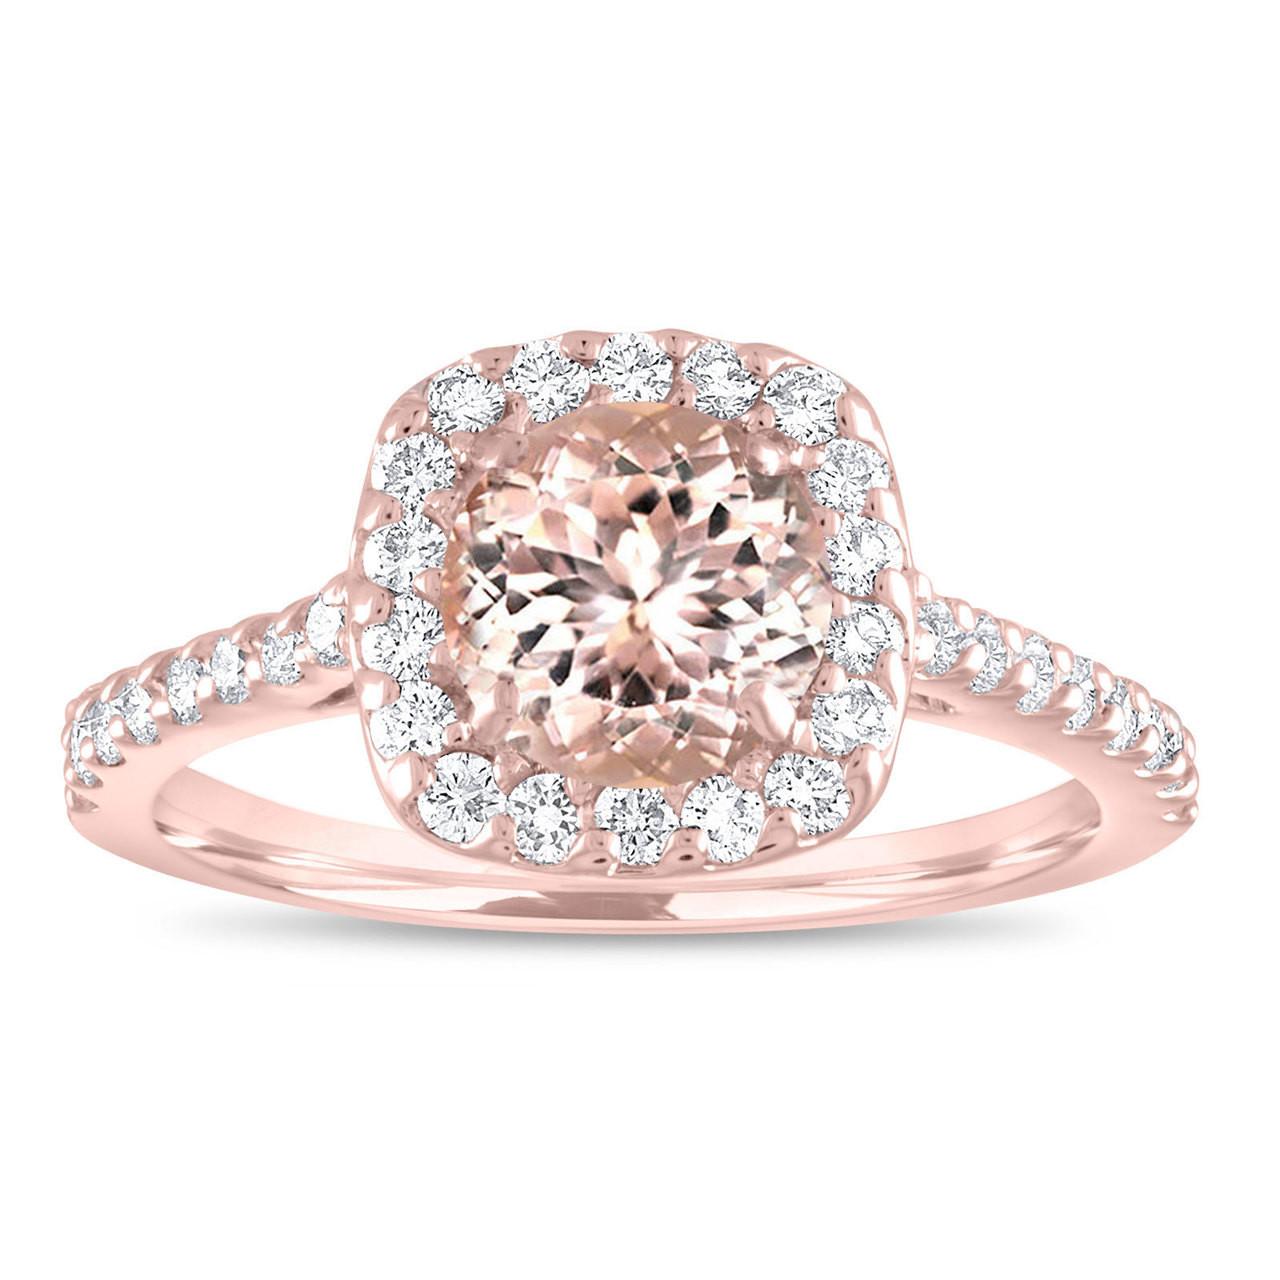 Morganite Engagement Ring Rose Gold Pink Morganite Cushion Cut